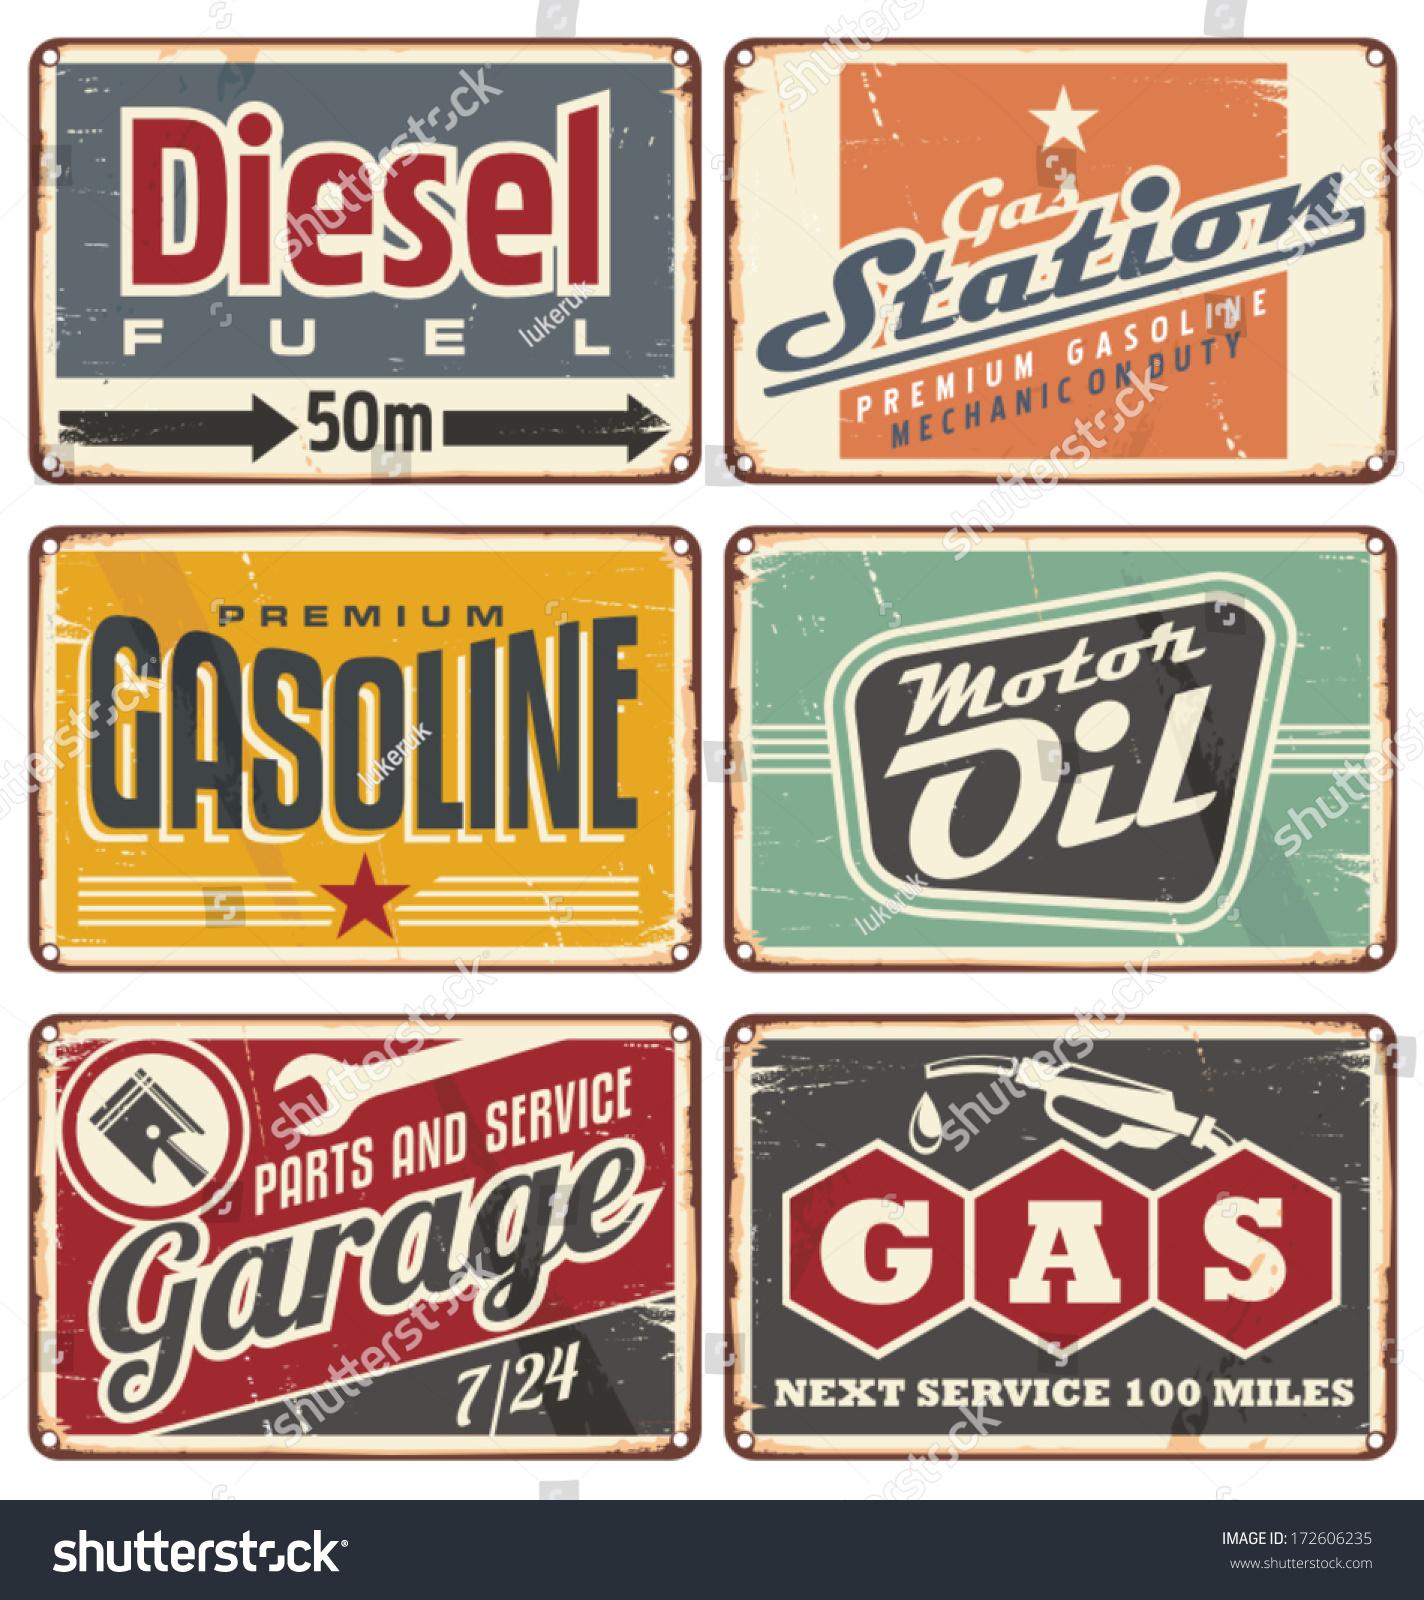 Vintage Metal Car Signs : Gas stations car service vintage tin stock vector